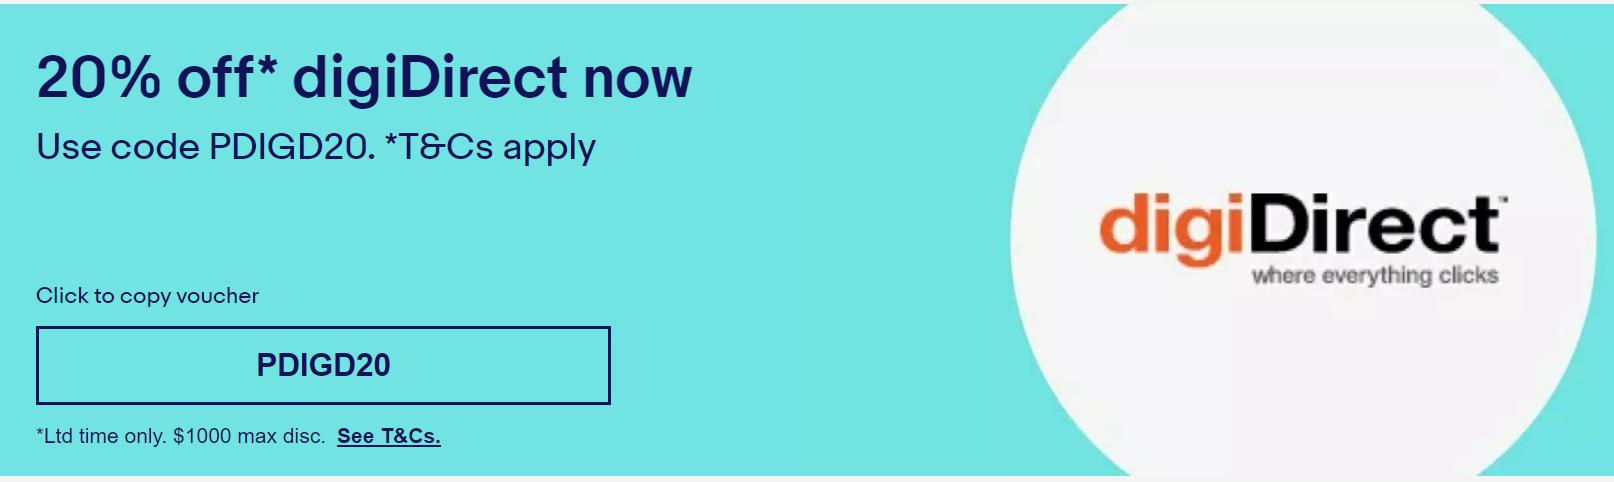 eBay DigiDirect - Extra 20% off storewide